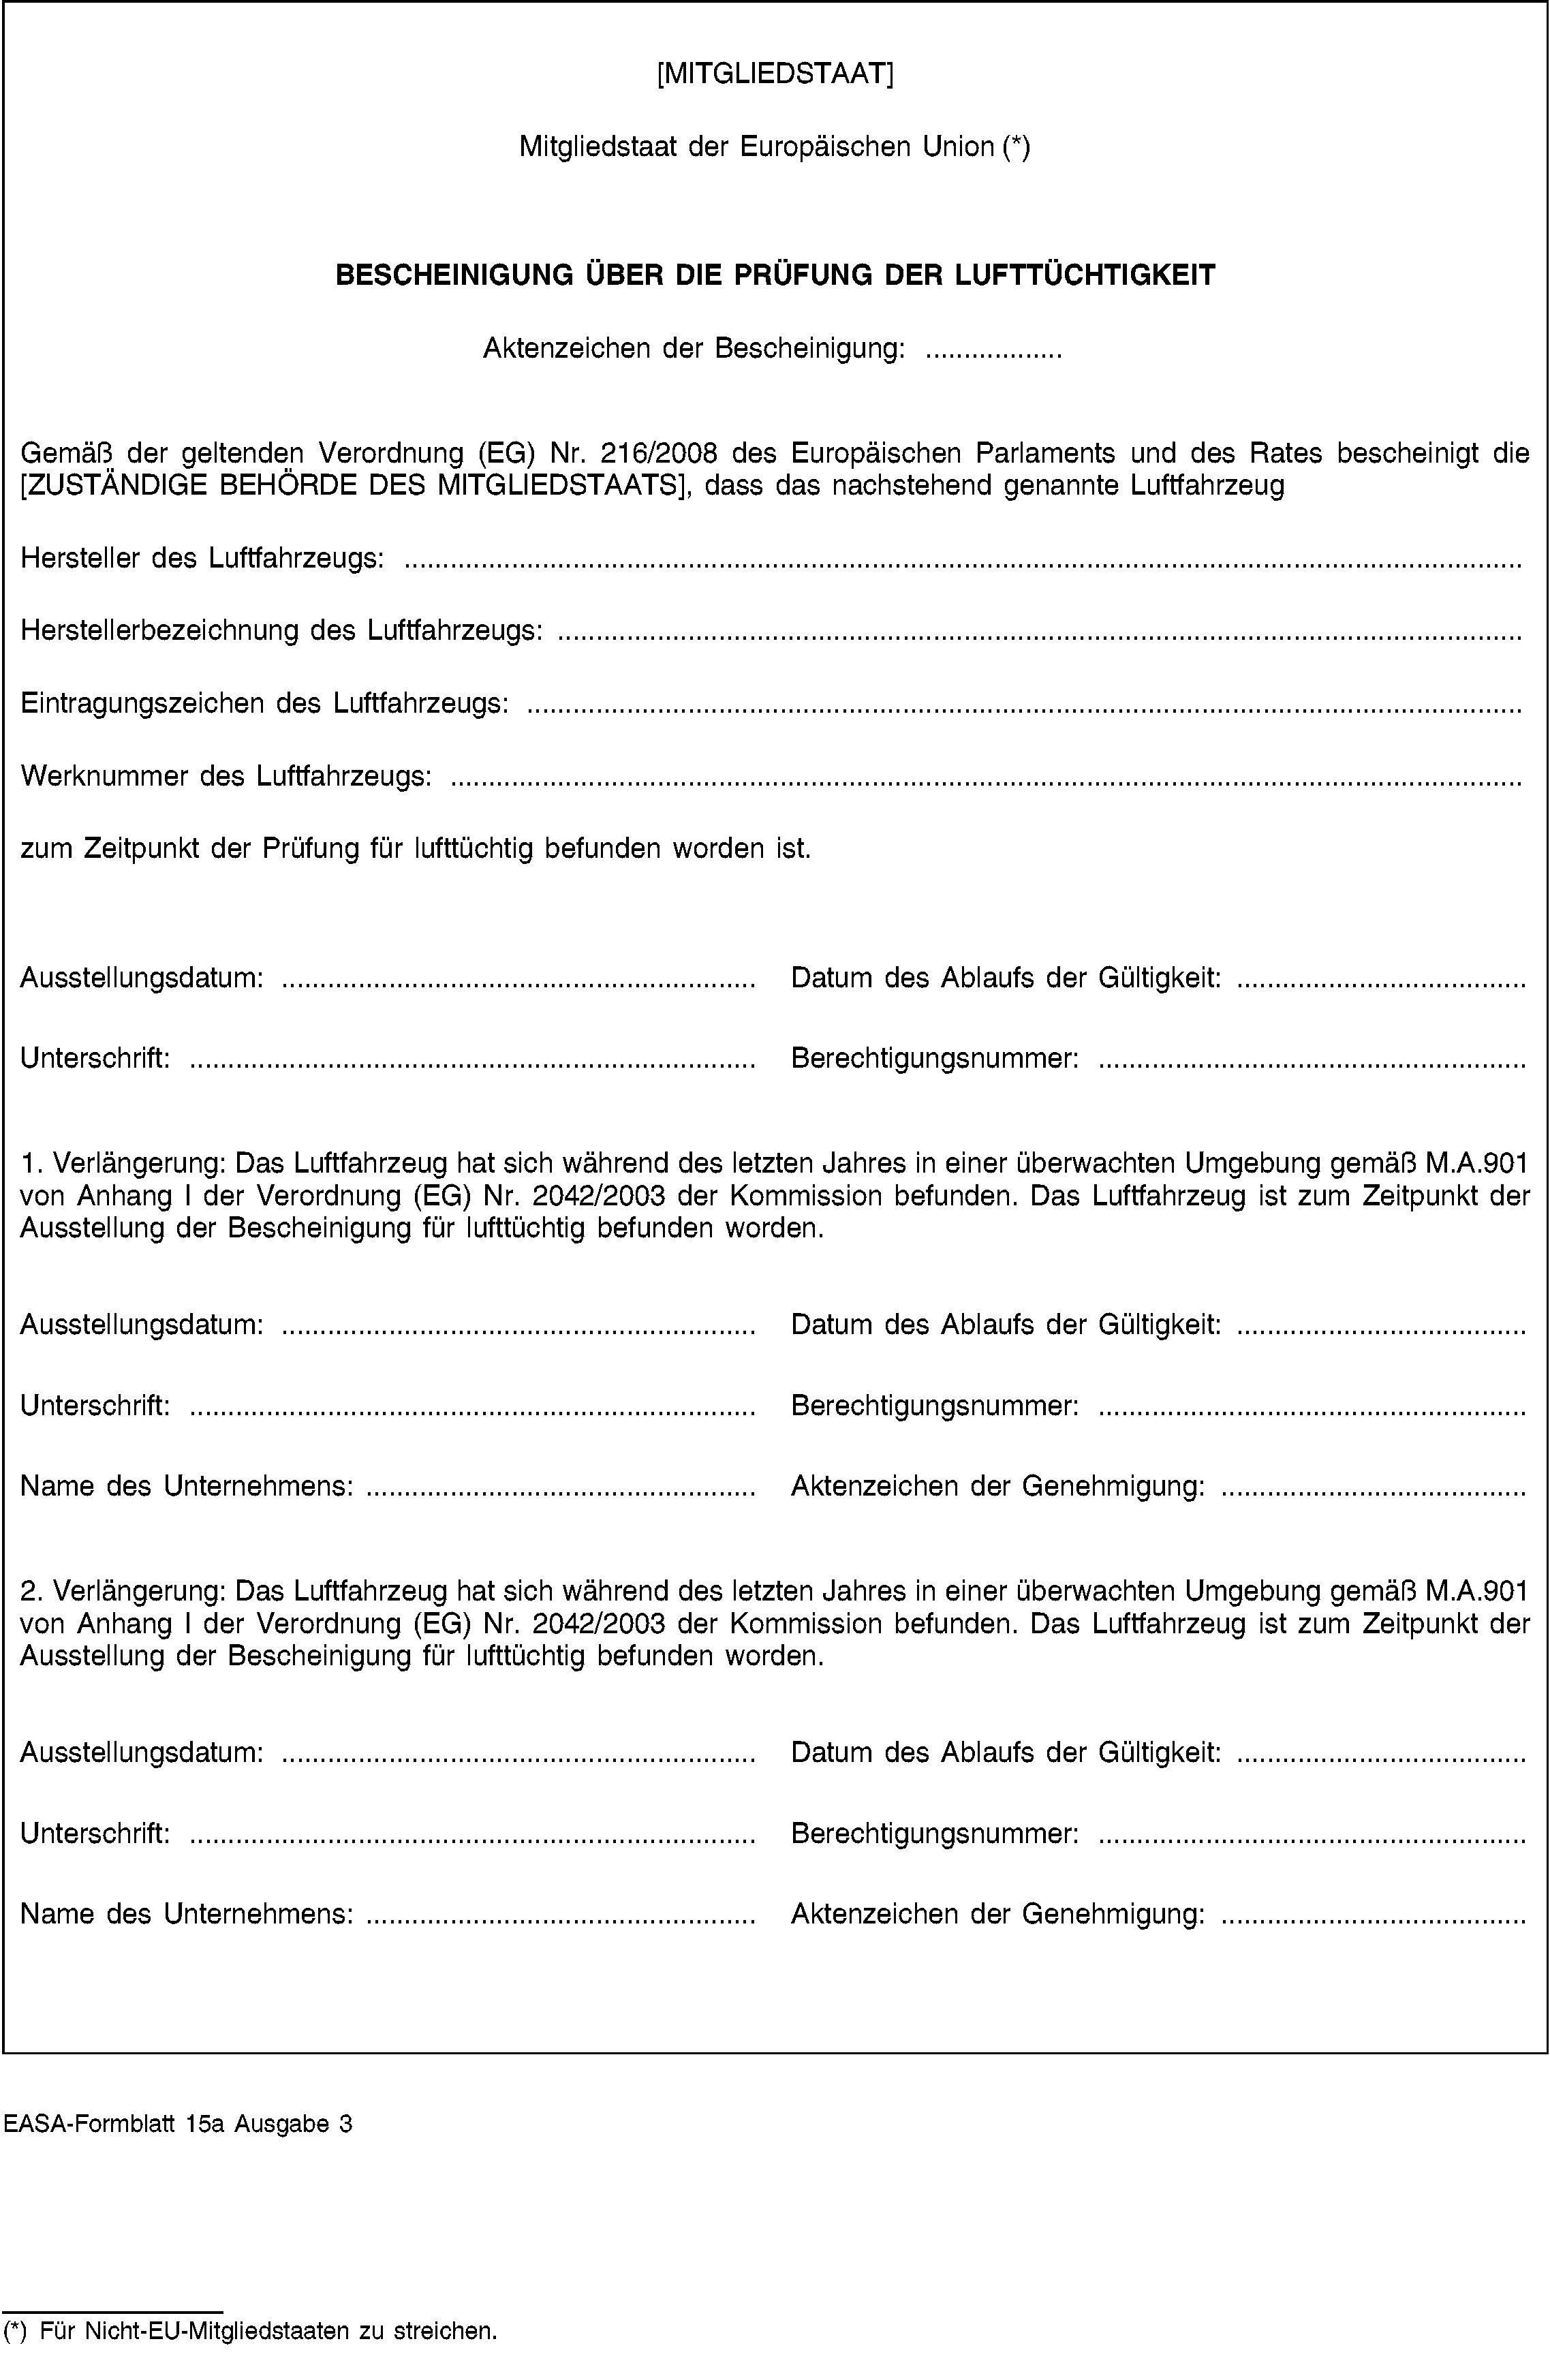 EUR-Lex - 02003R2042-20120801 - EN - EUR-Lex